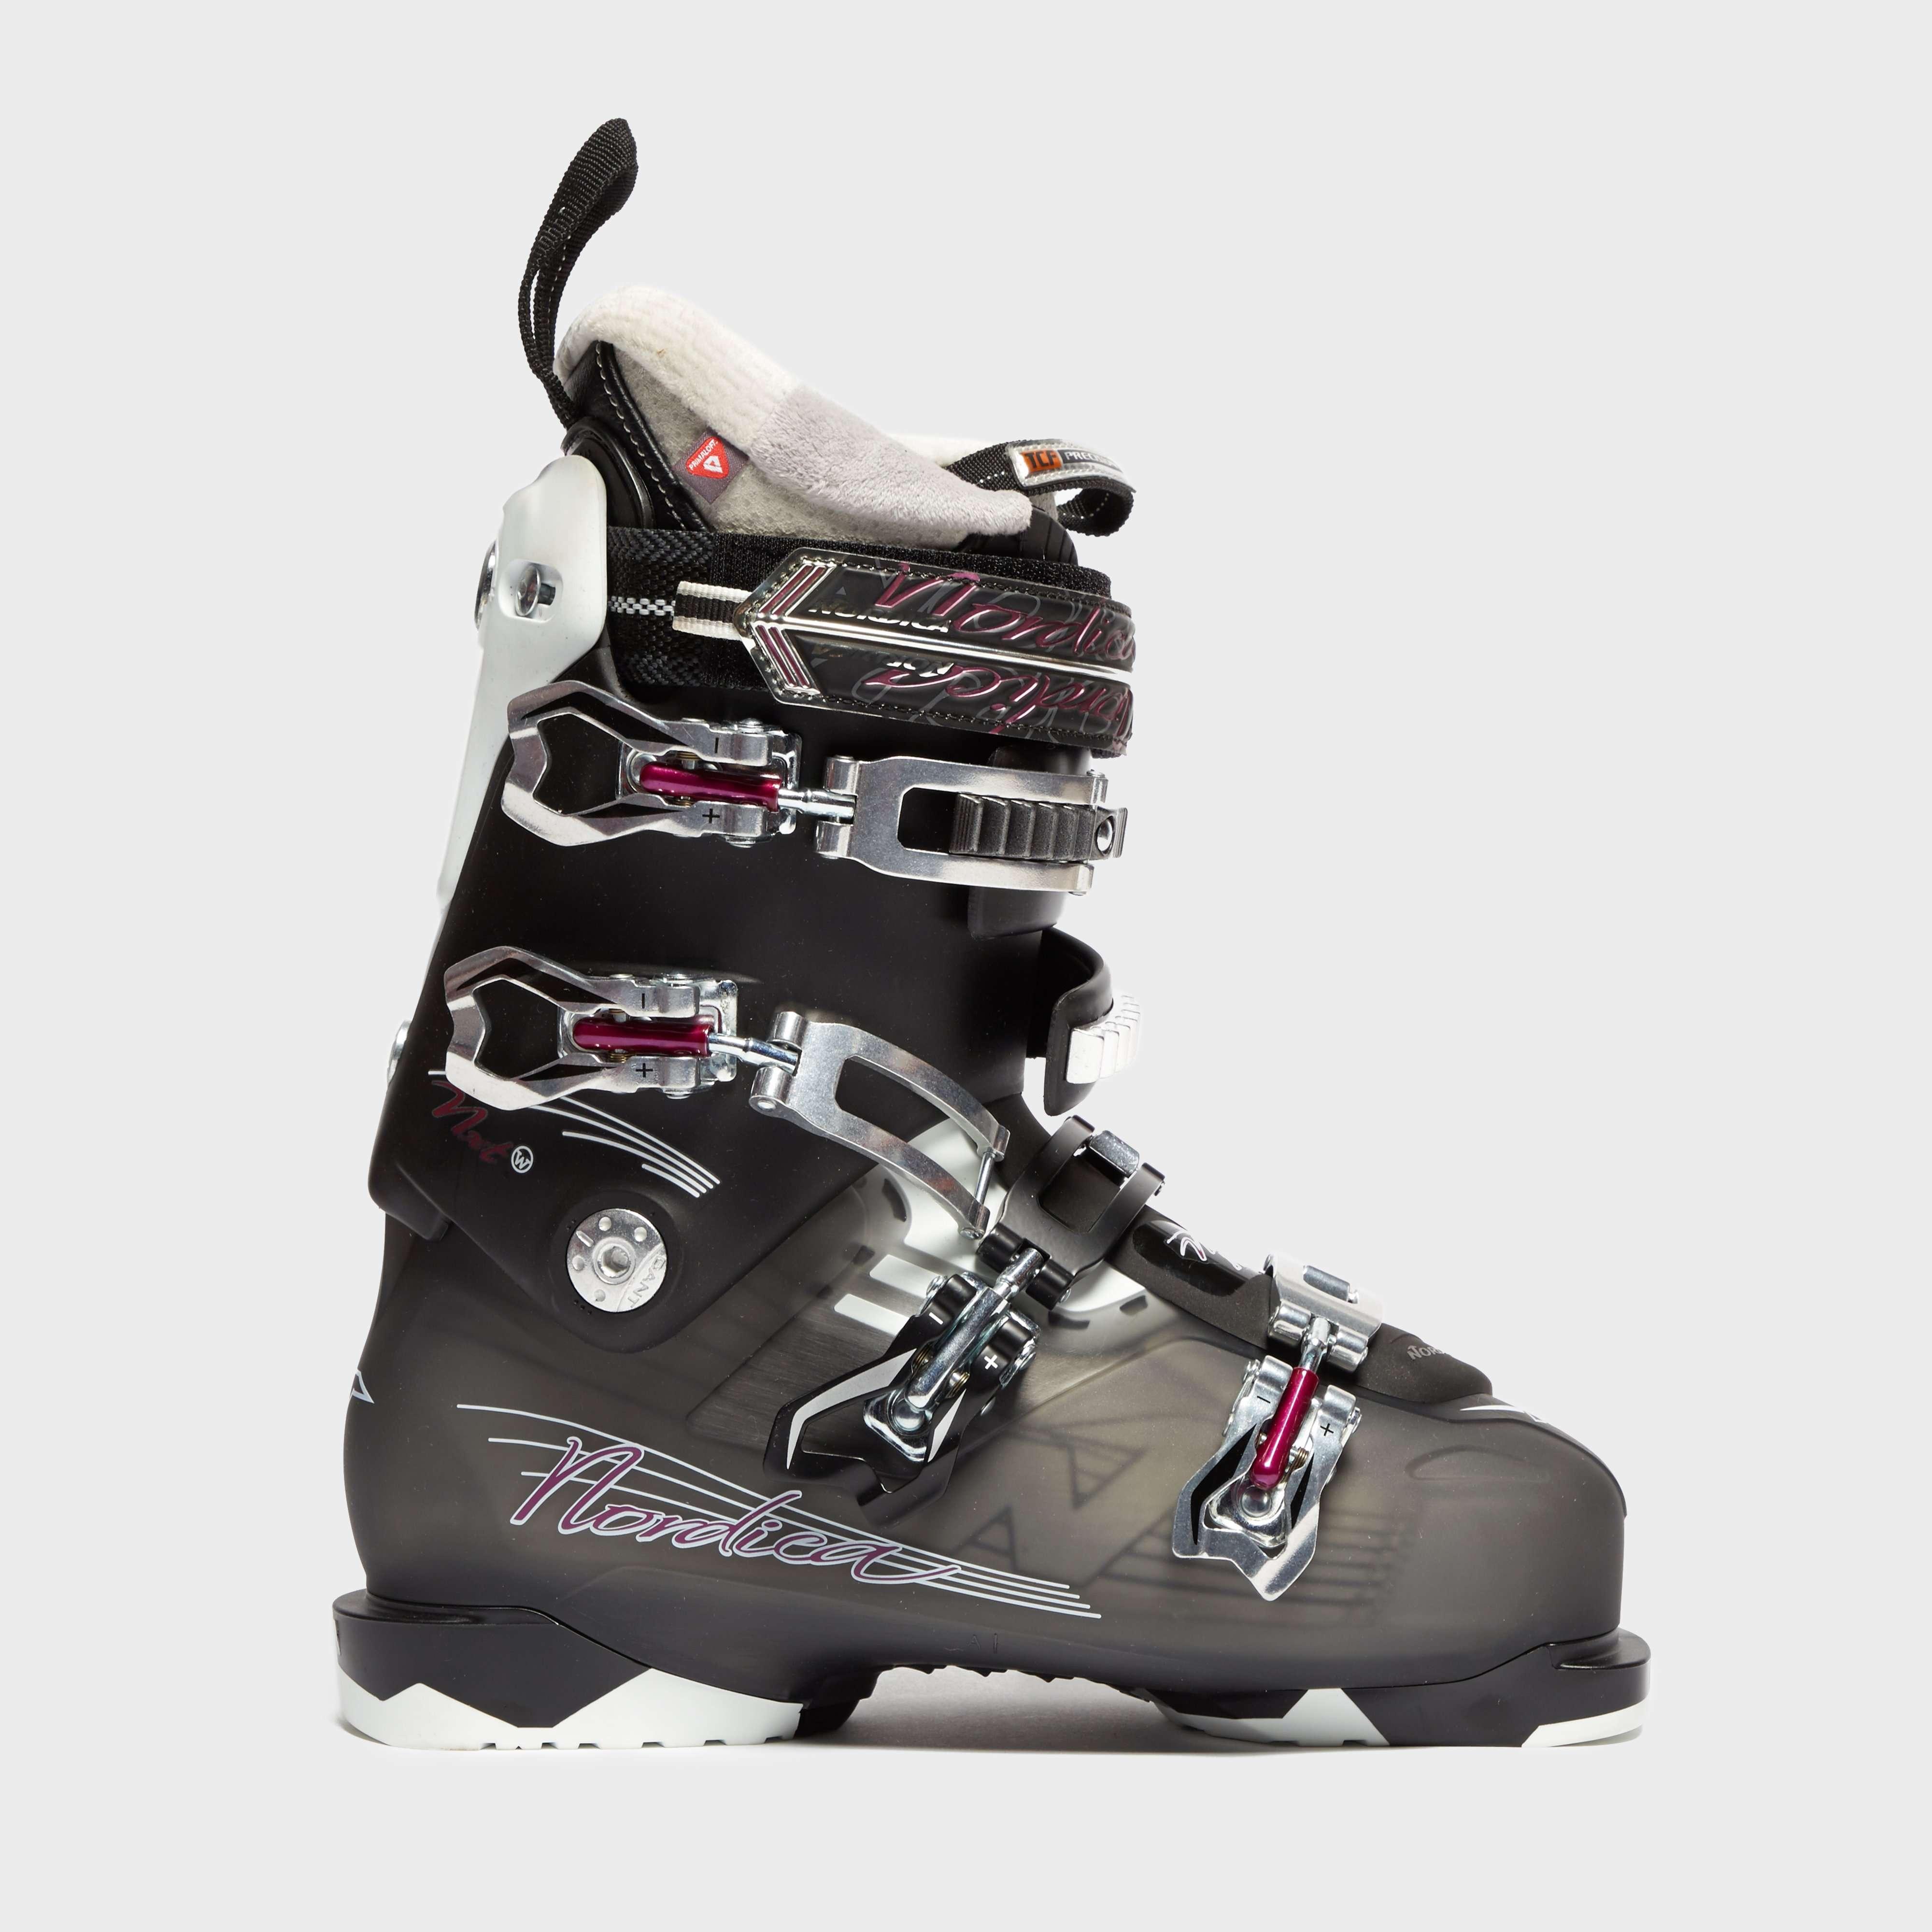 NORDICA Women's NXT N2 Ski Boots